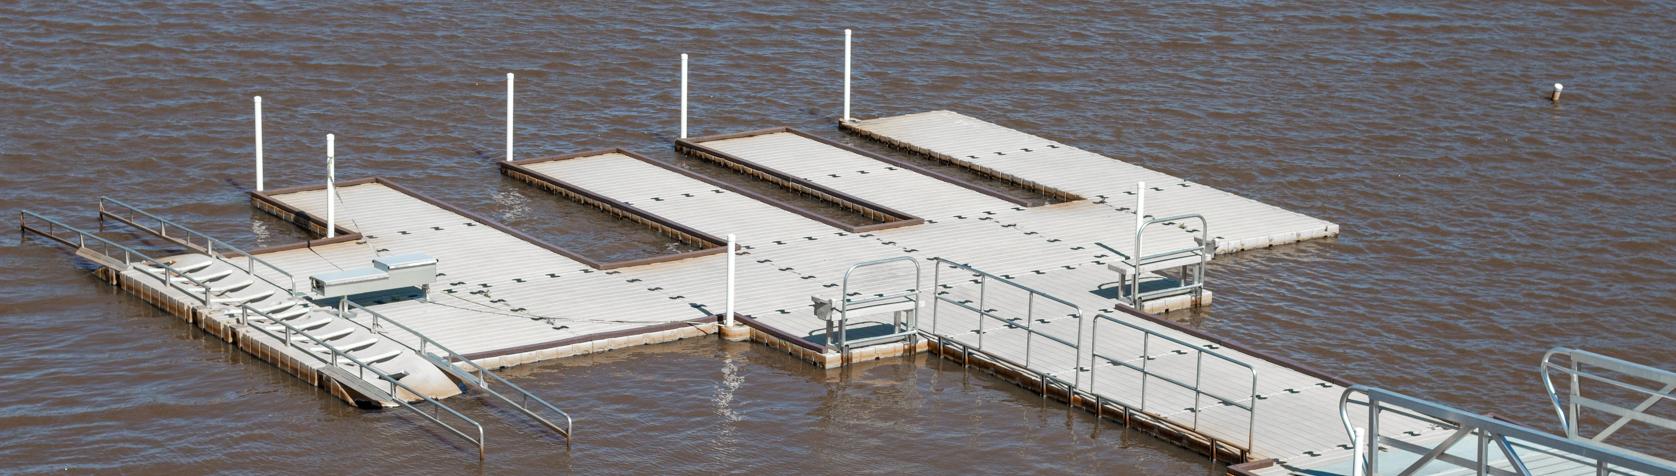 docks-onlake